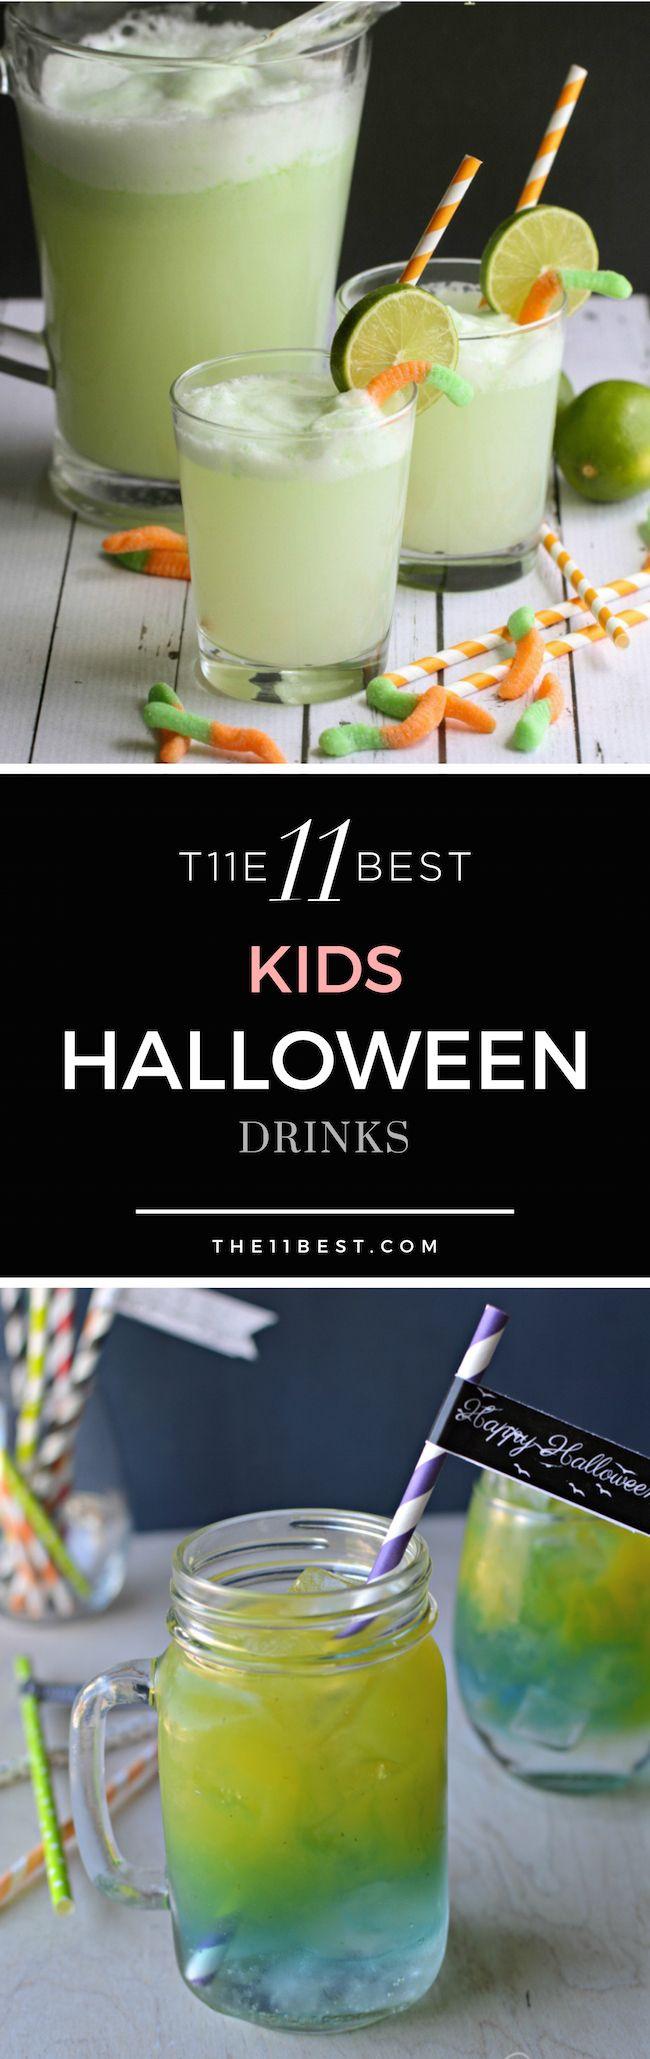 Best Halloween Drinks  1000 ideas about Halloween Drinks on Pinterest